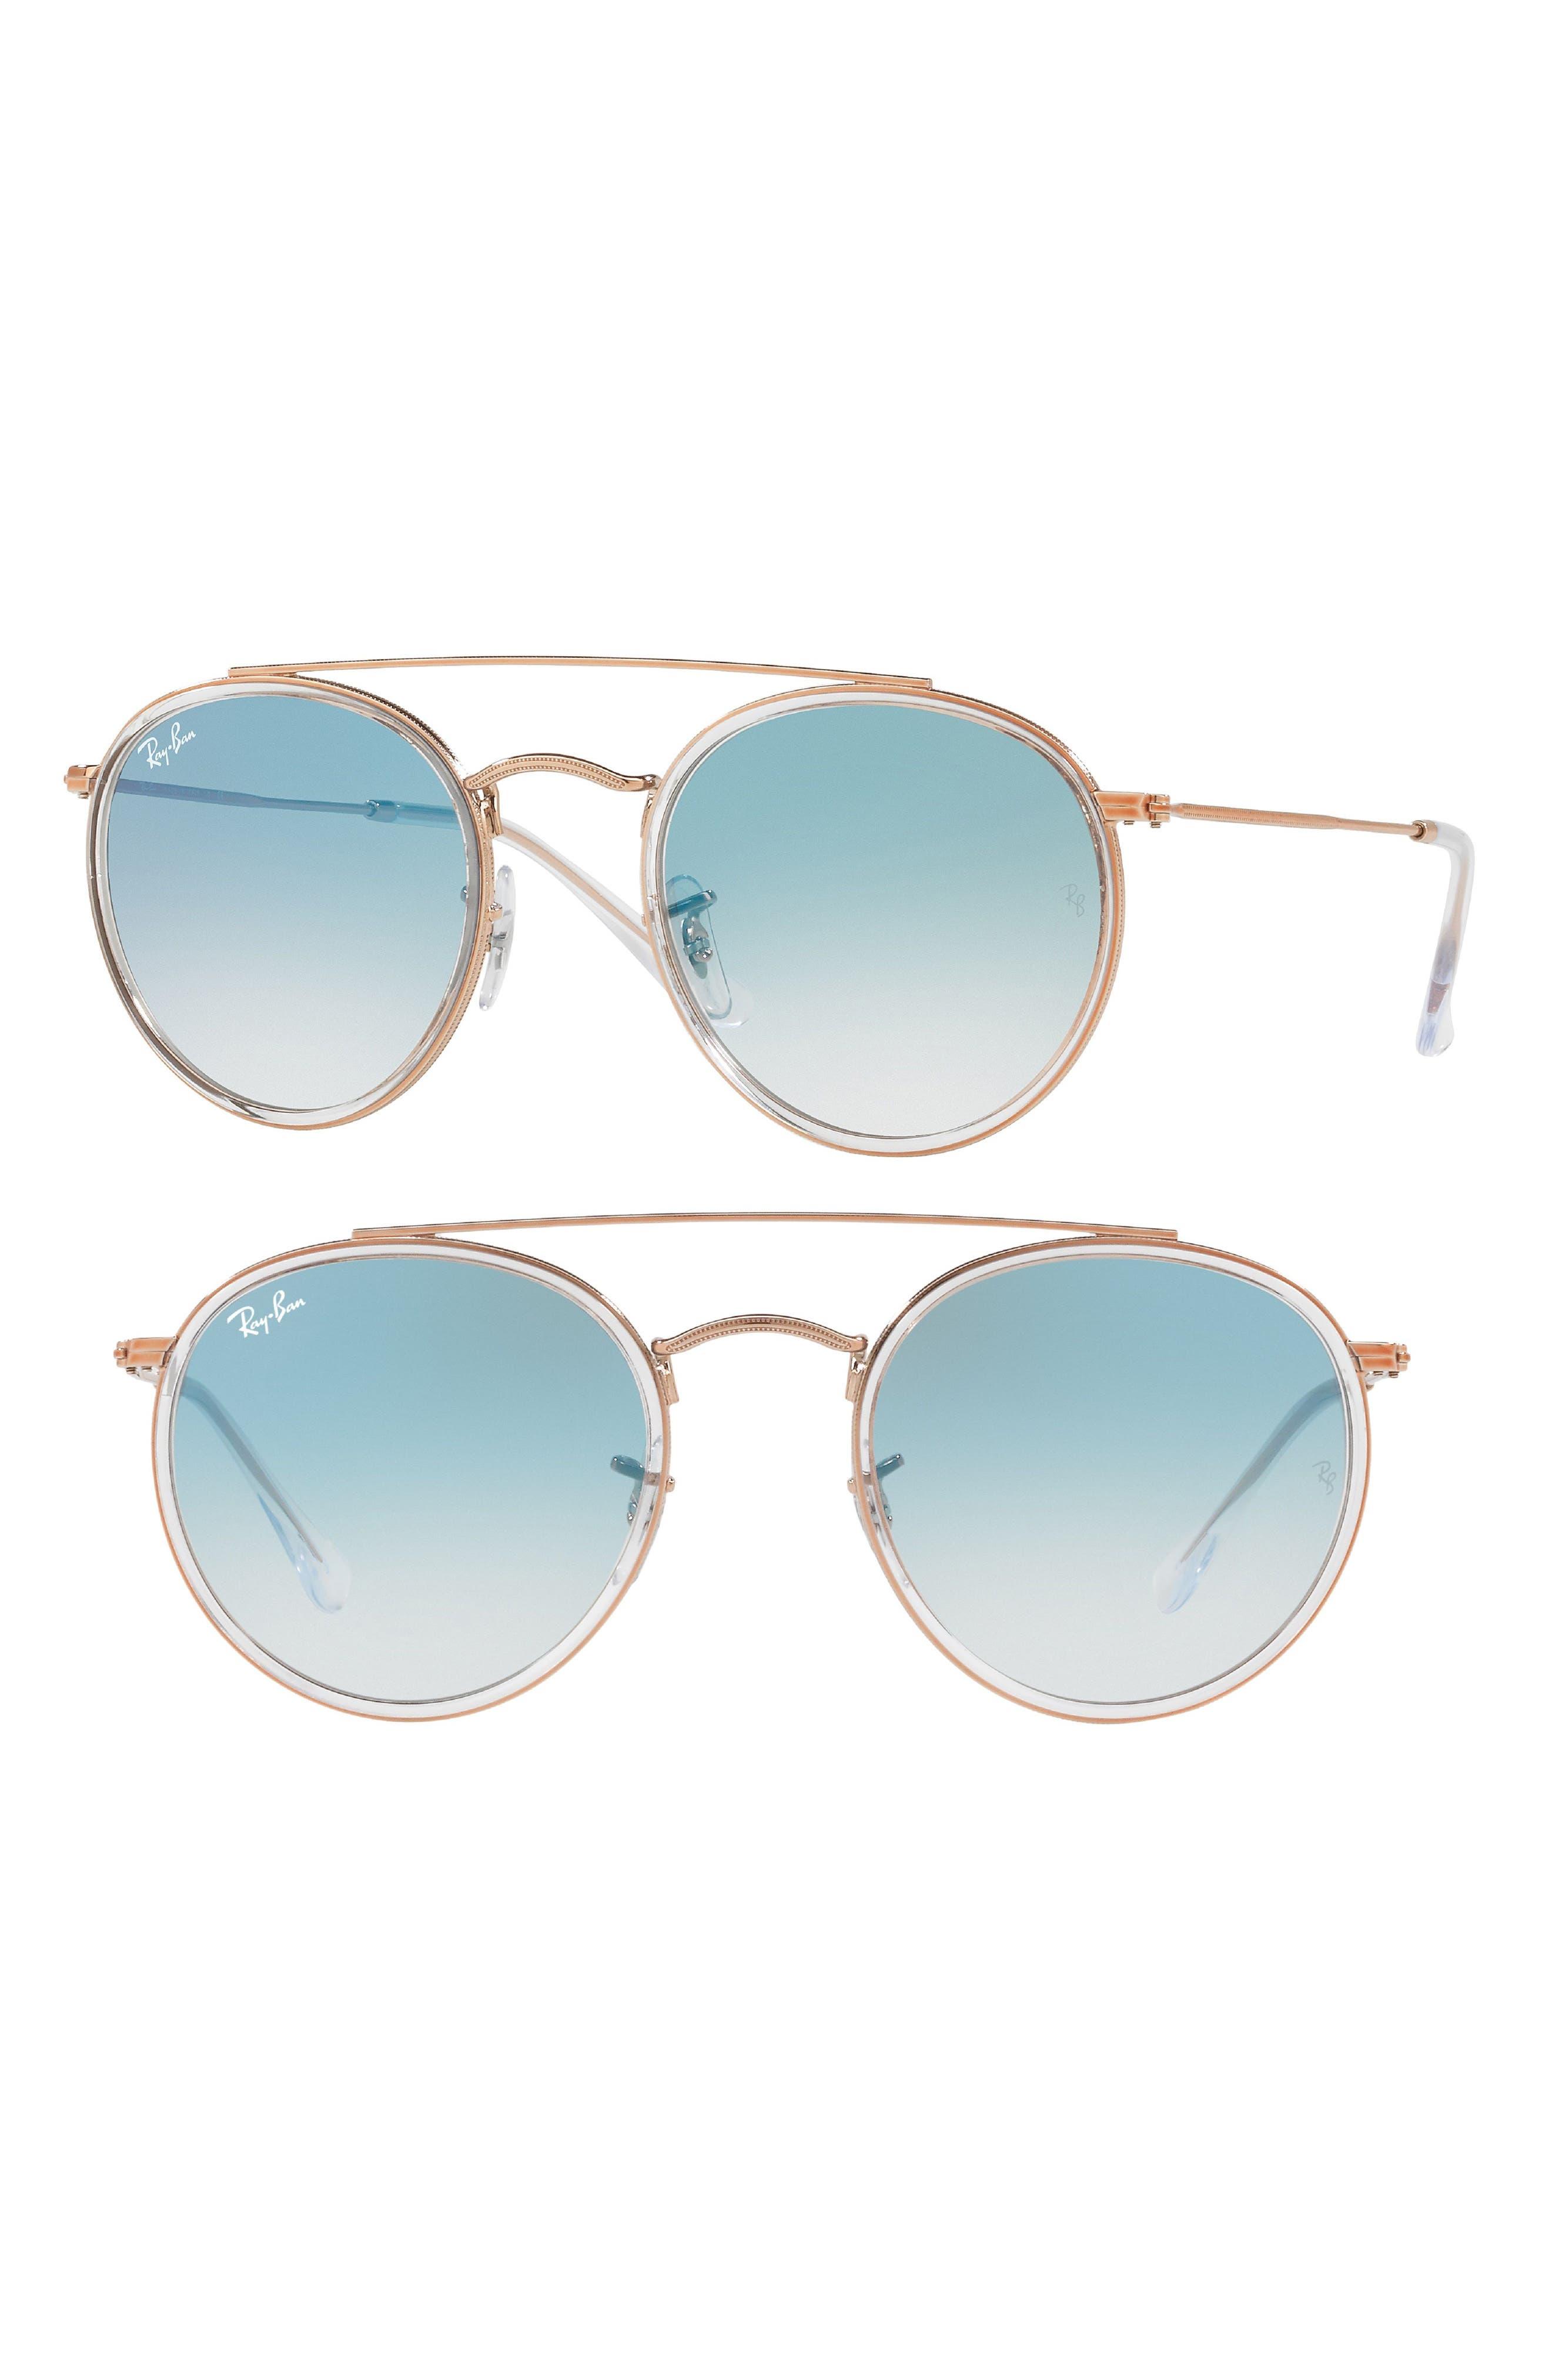 6cfd32655258 Ray-Ban 51Mm Aviator Gradient Lens Sunglasses -